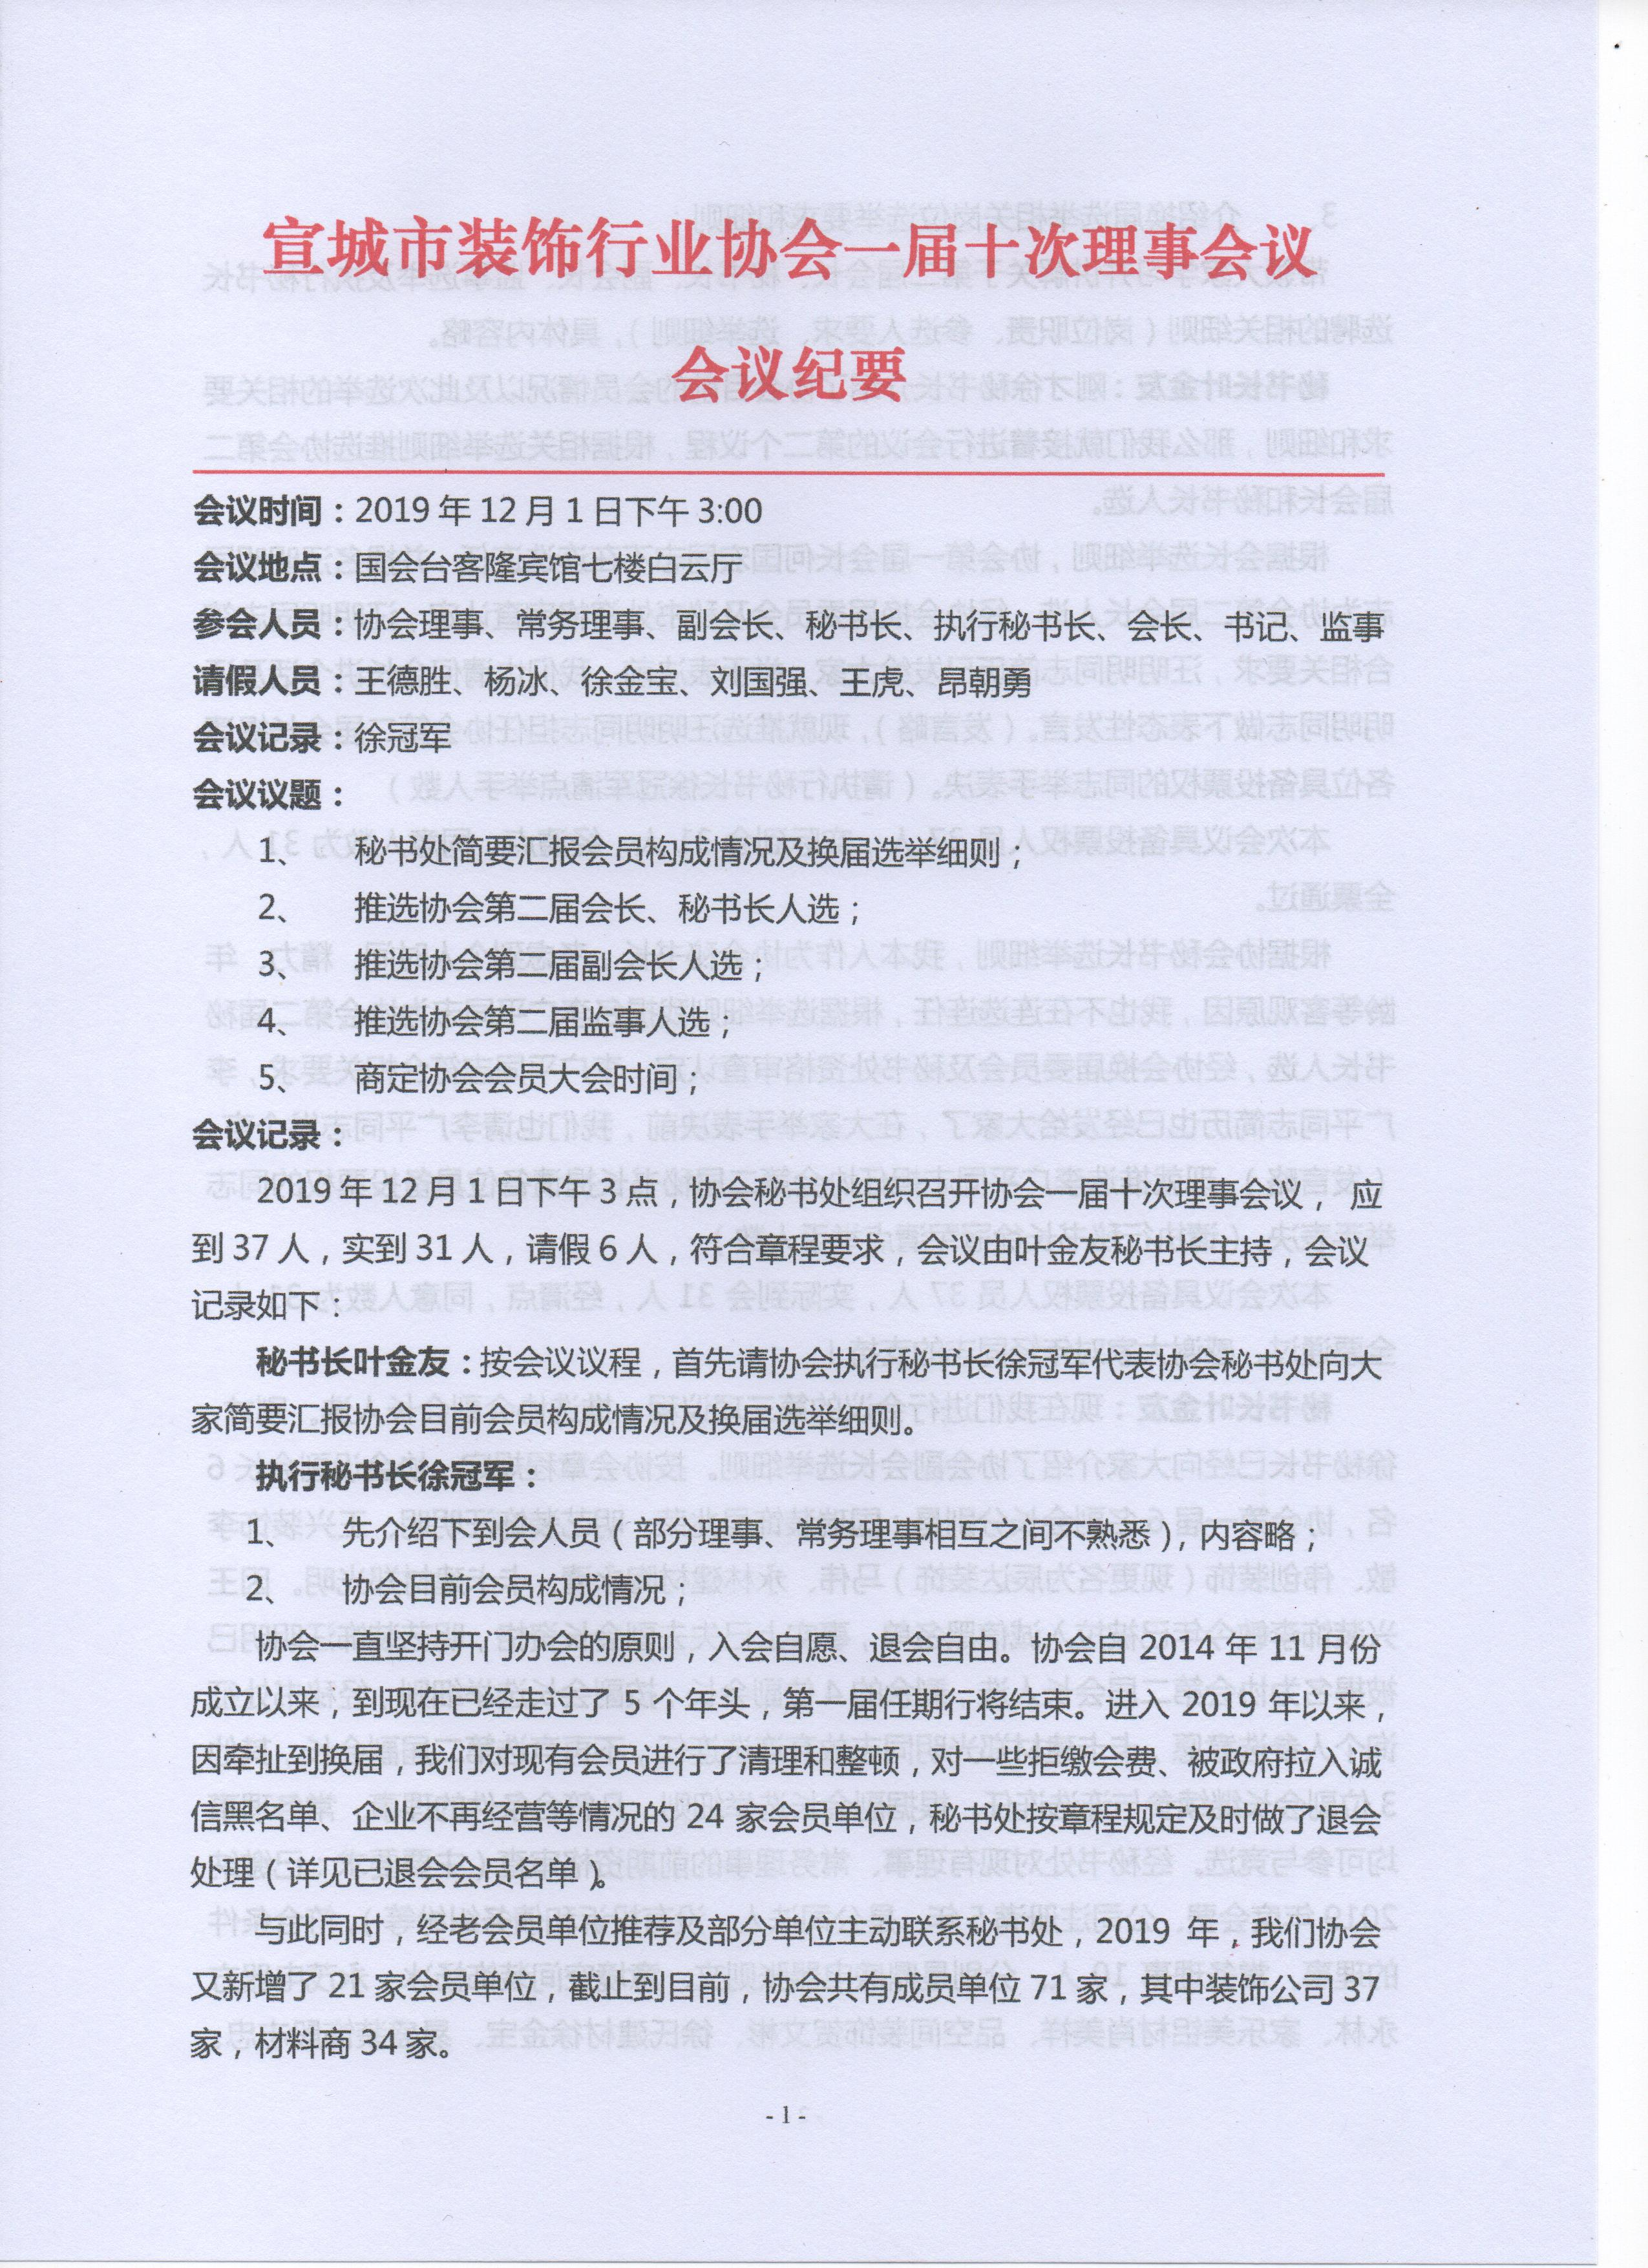 beplay亚洲官网beplay注册行业协会一届十次理事会议会议纪要1